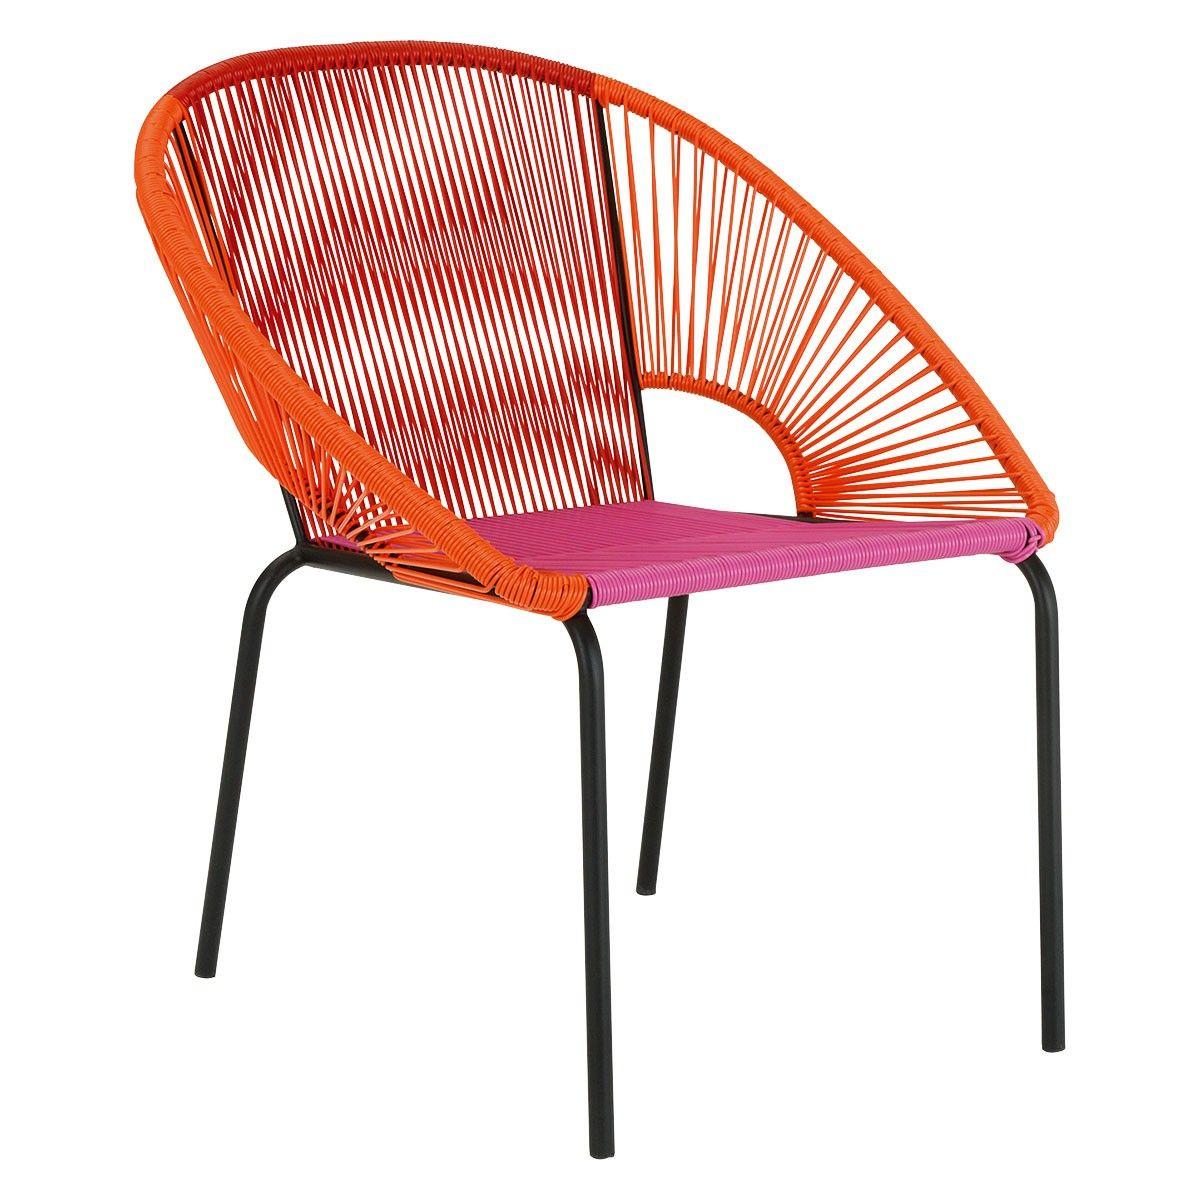 JAMBI Pink and orange woven garden chair  Garden furniture chairs